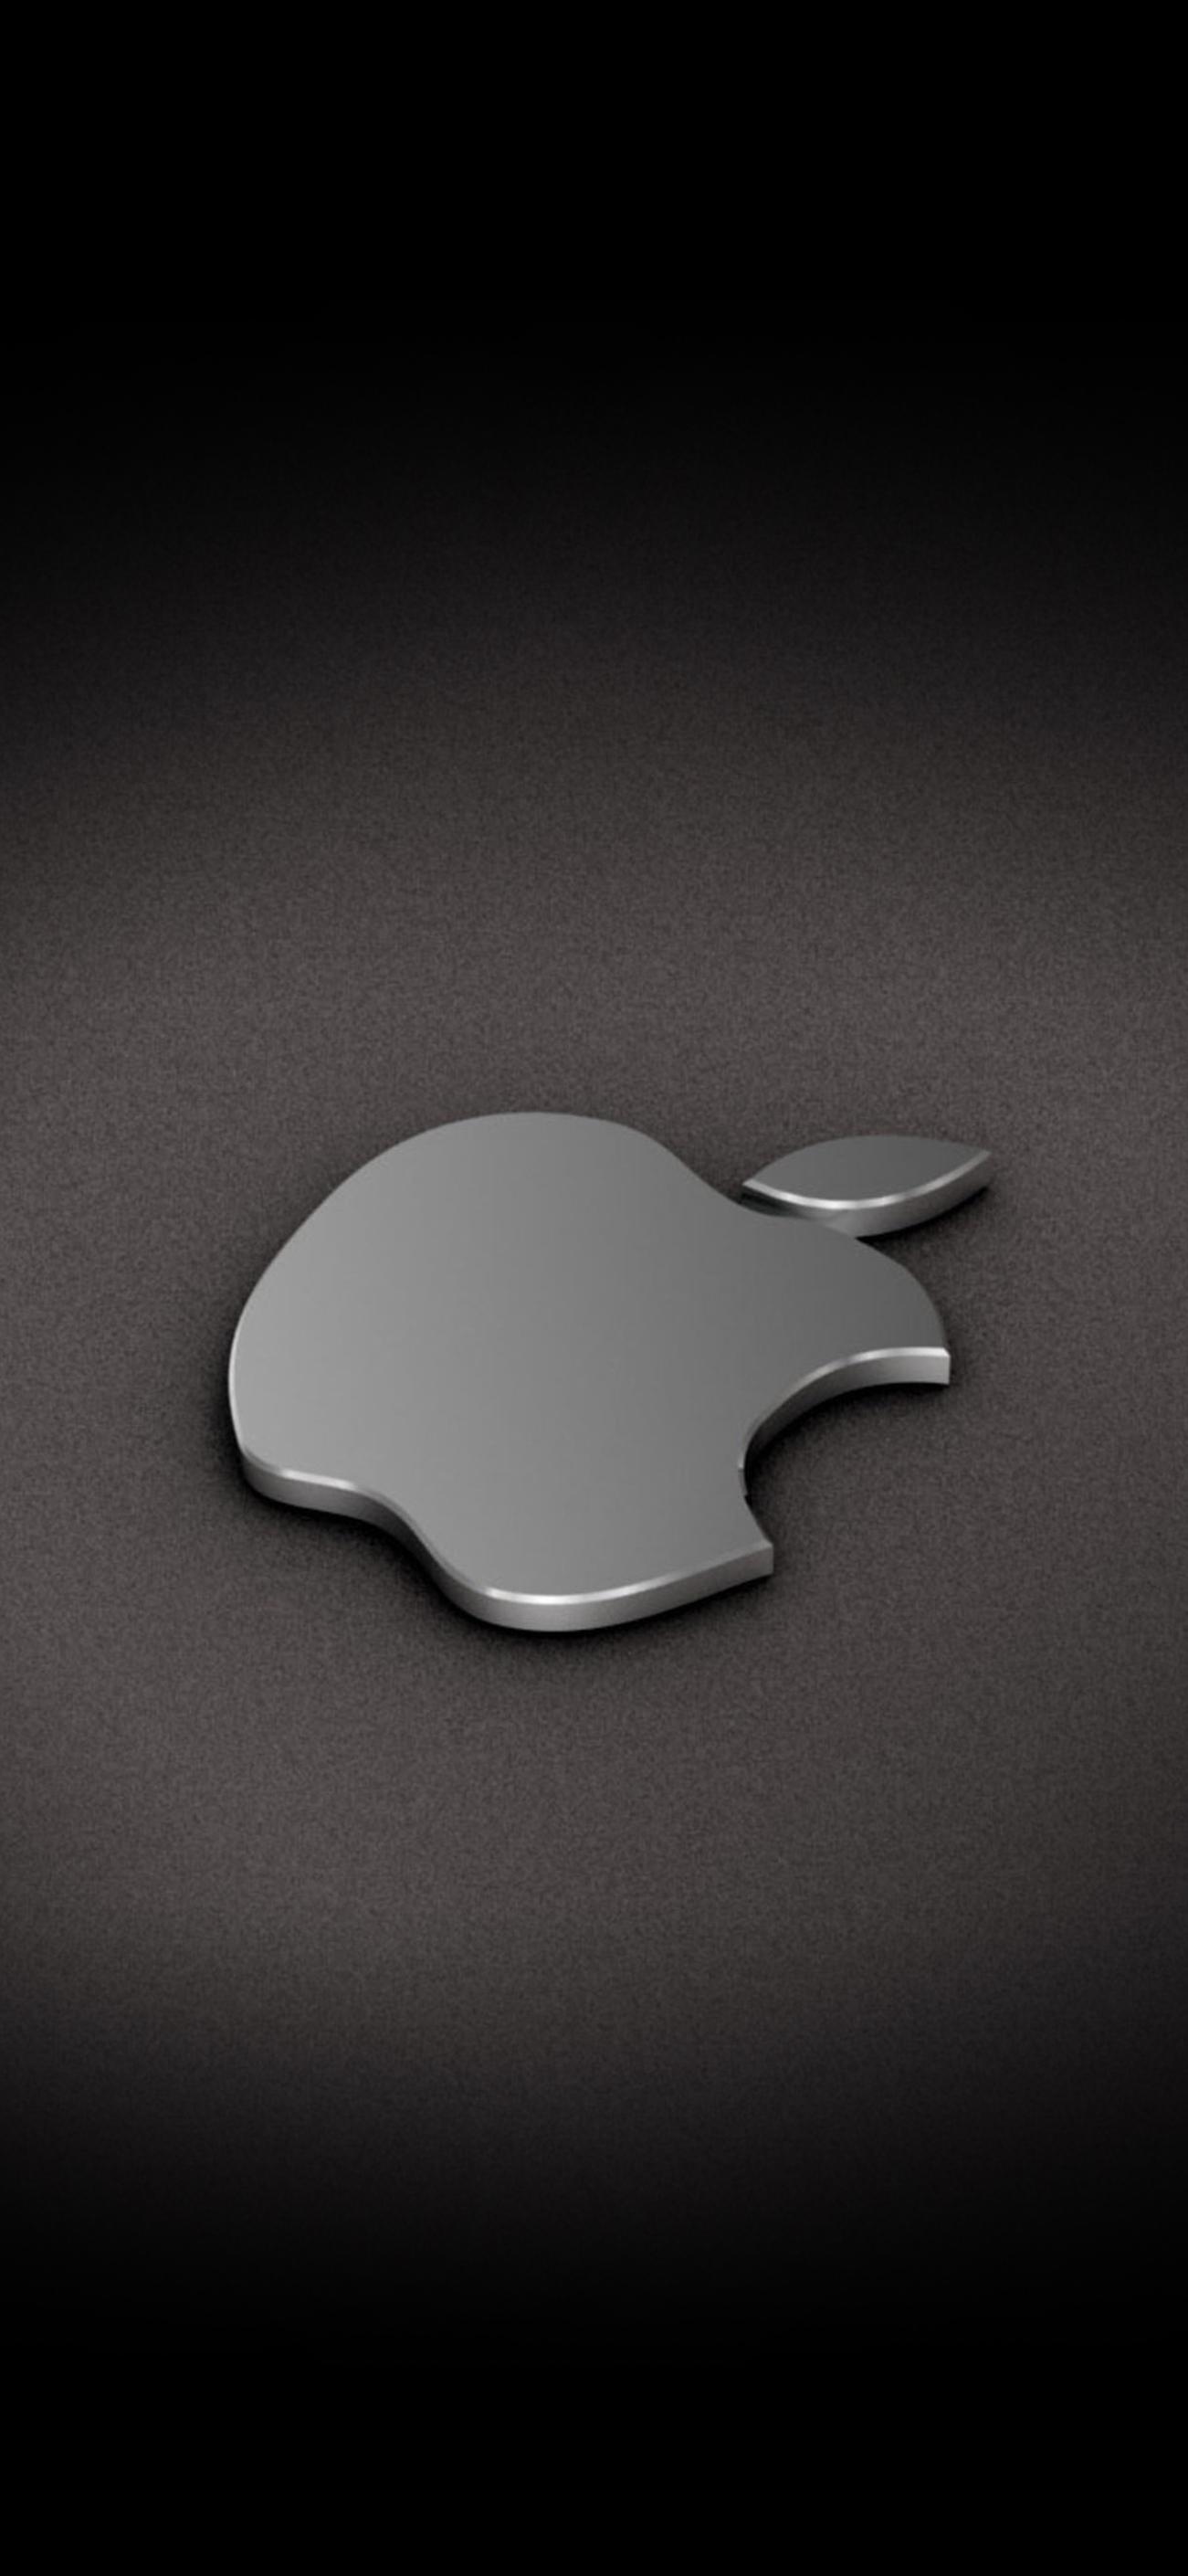 Iphone ノッチが目立たない壁紙 Apple ロゴ Free Apple Papers